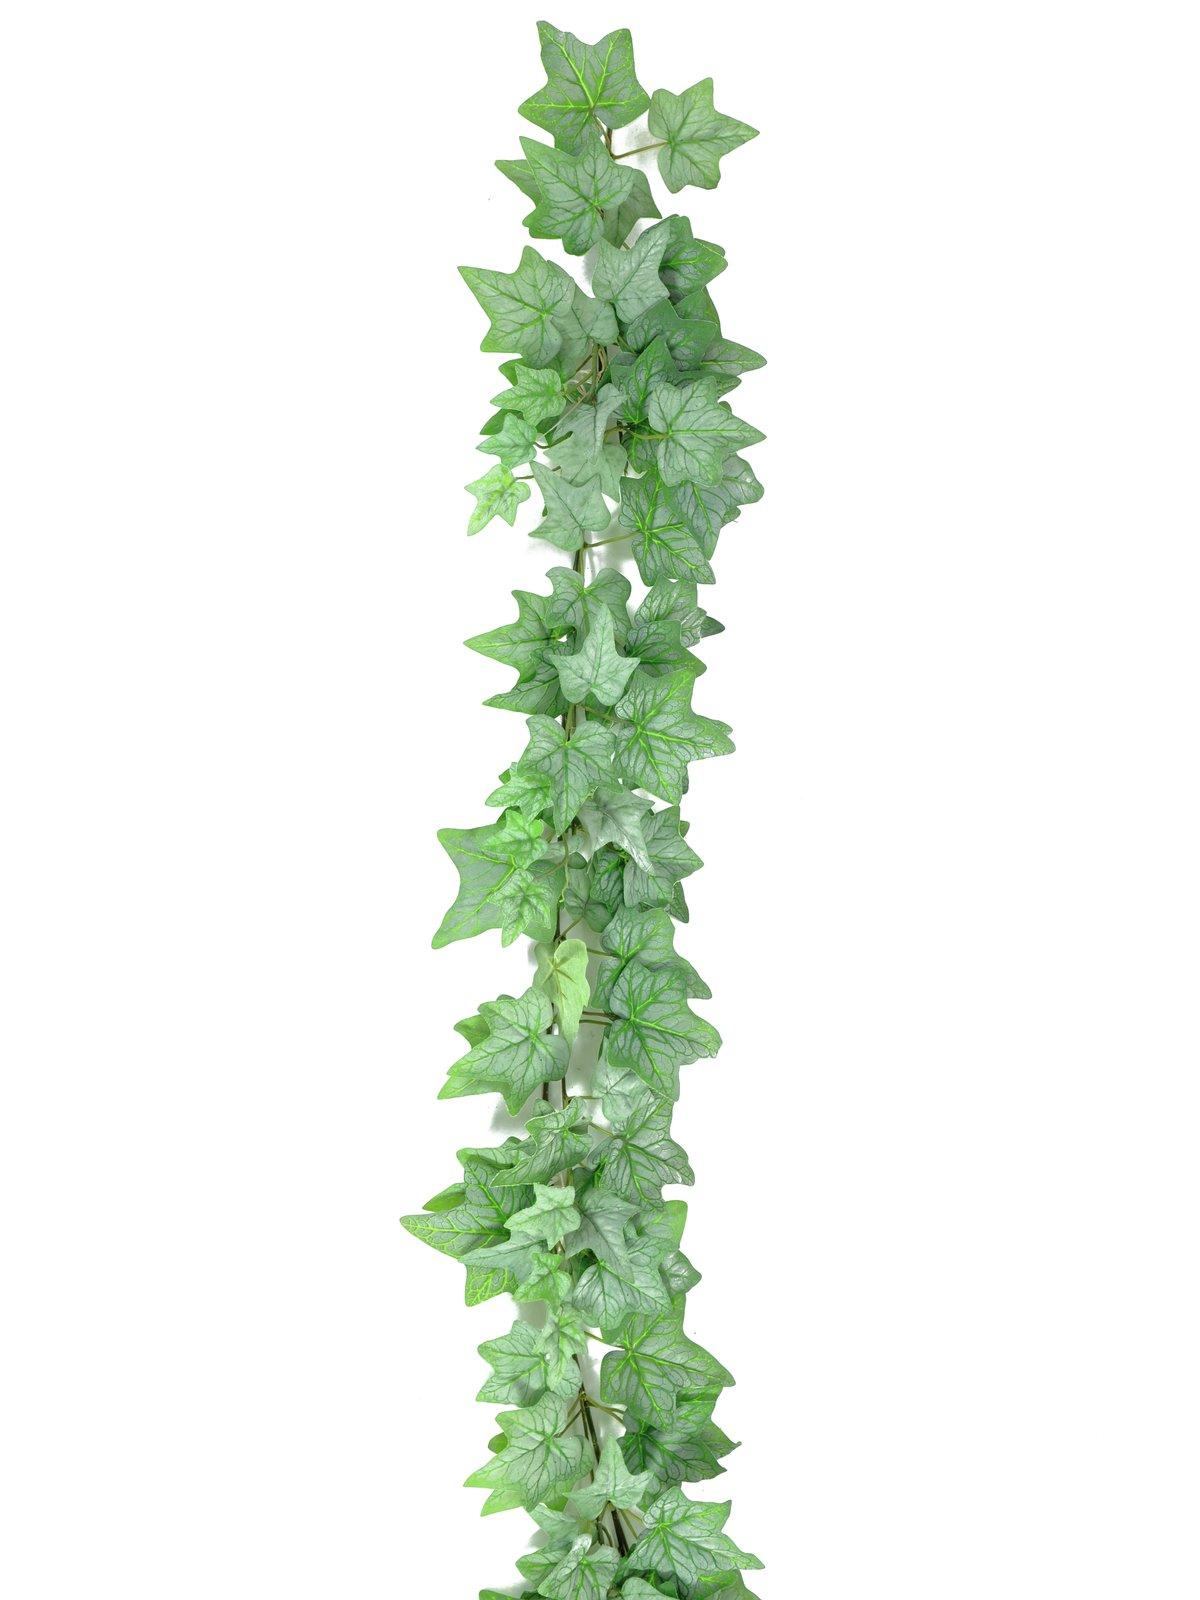 guirlande-lierre-artificiel-haut-de-gamme-180cm